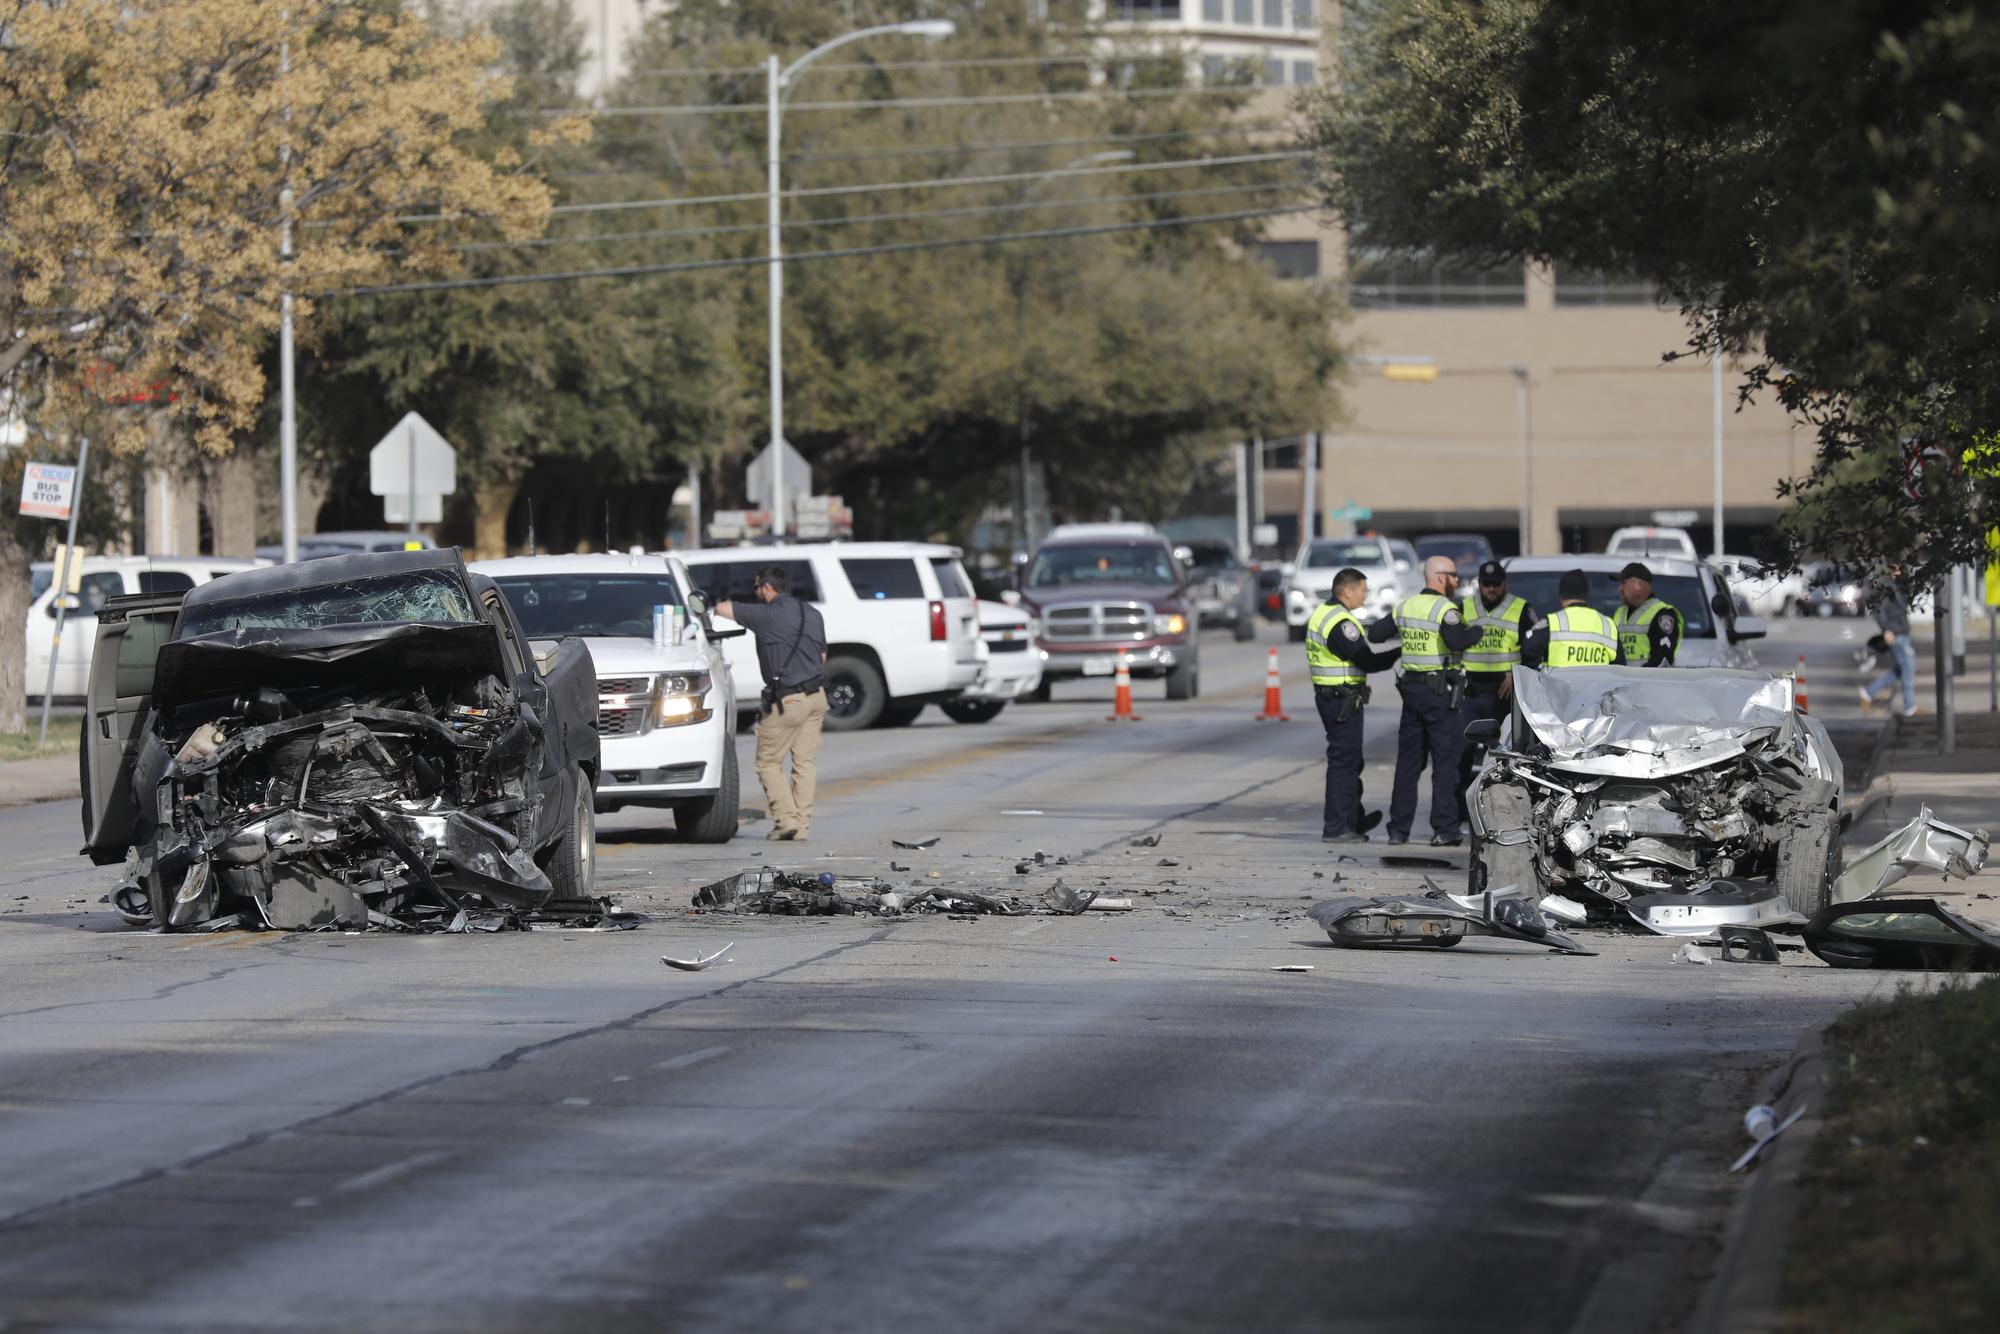 multi-vehicle crash sends two to hospital - midland reporter-telegram